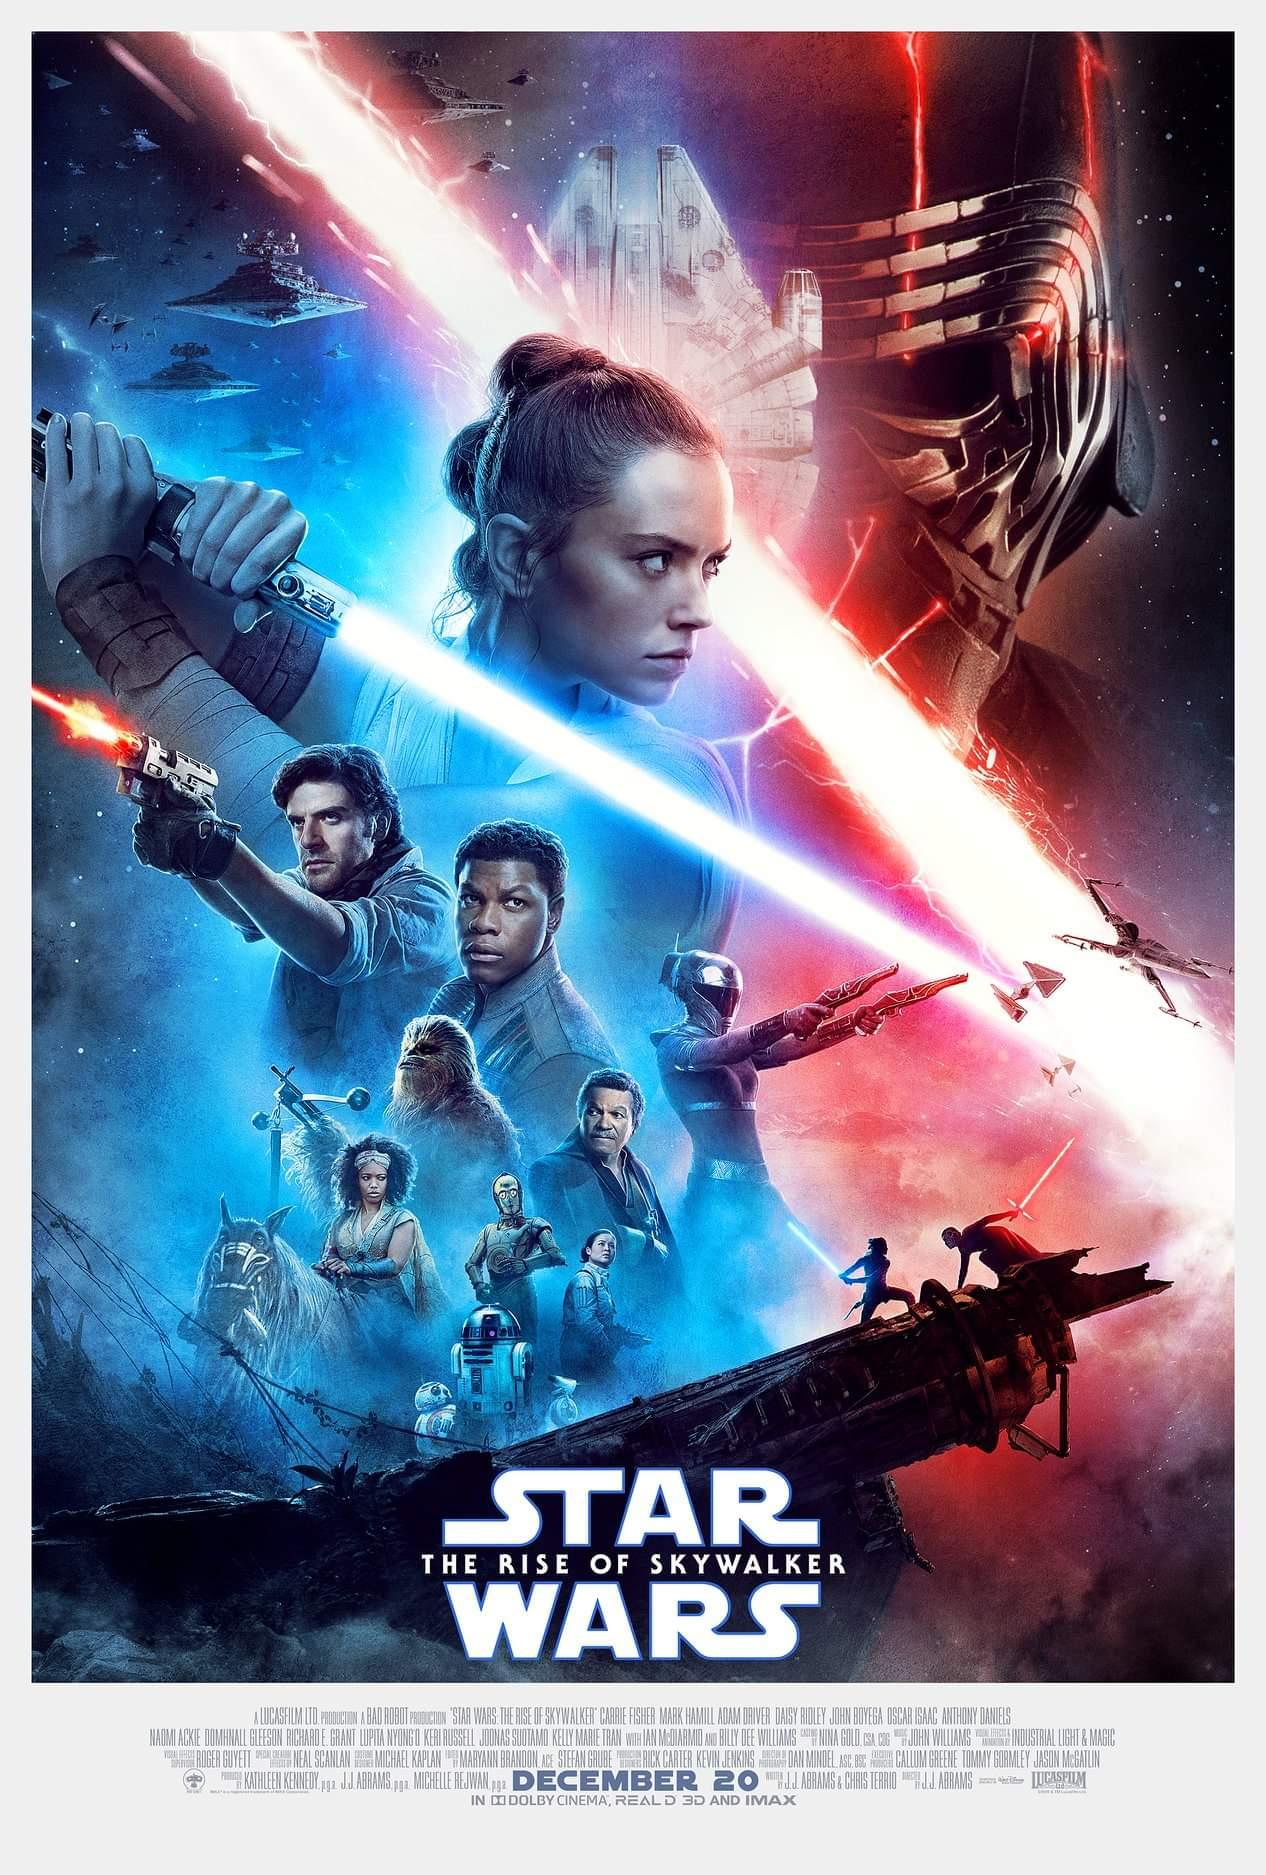 STAR WARS Hungarian Movie Poster Darth Vader Jedi Empire Skywalker